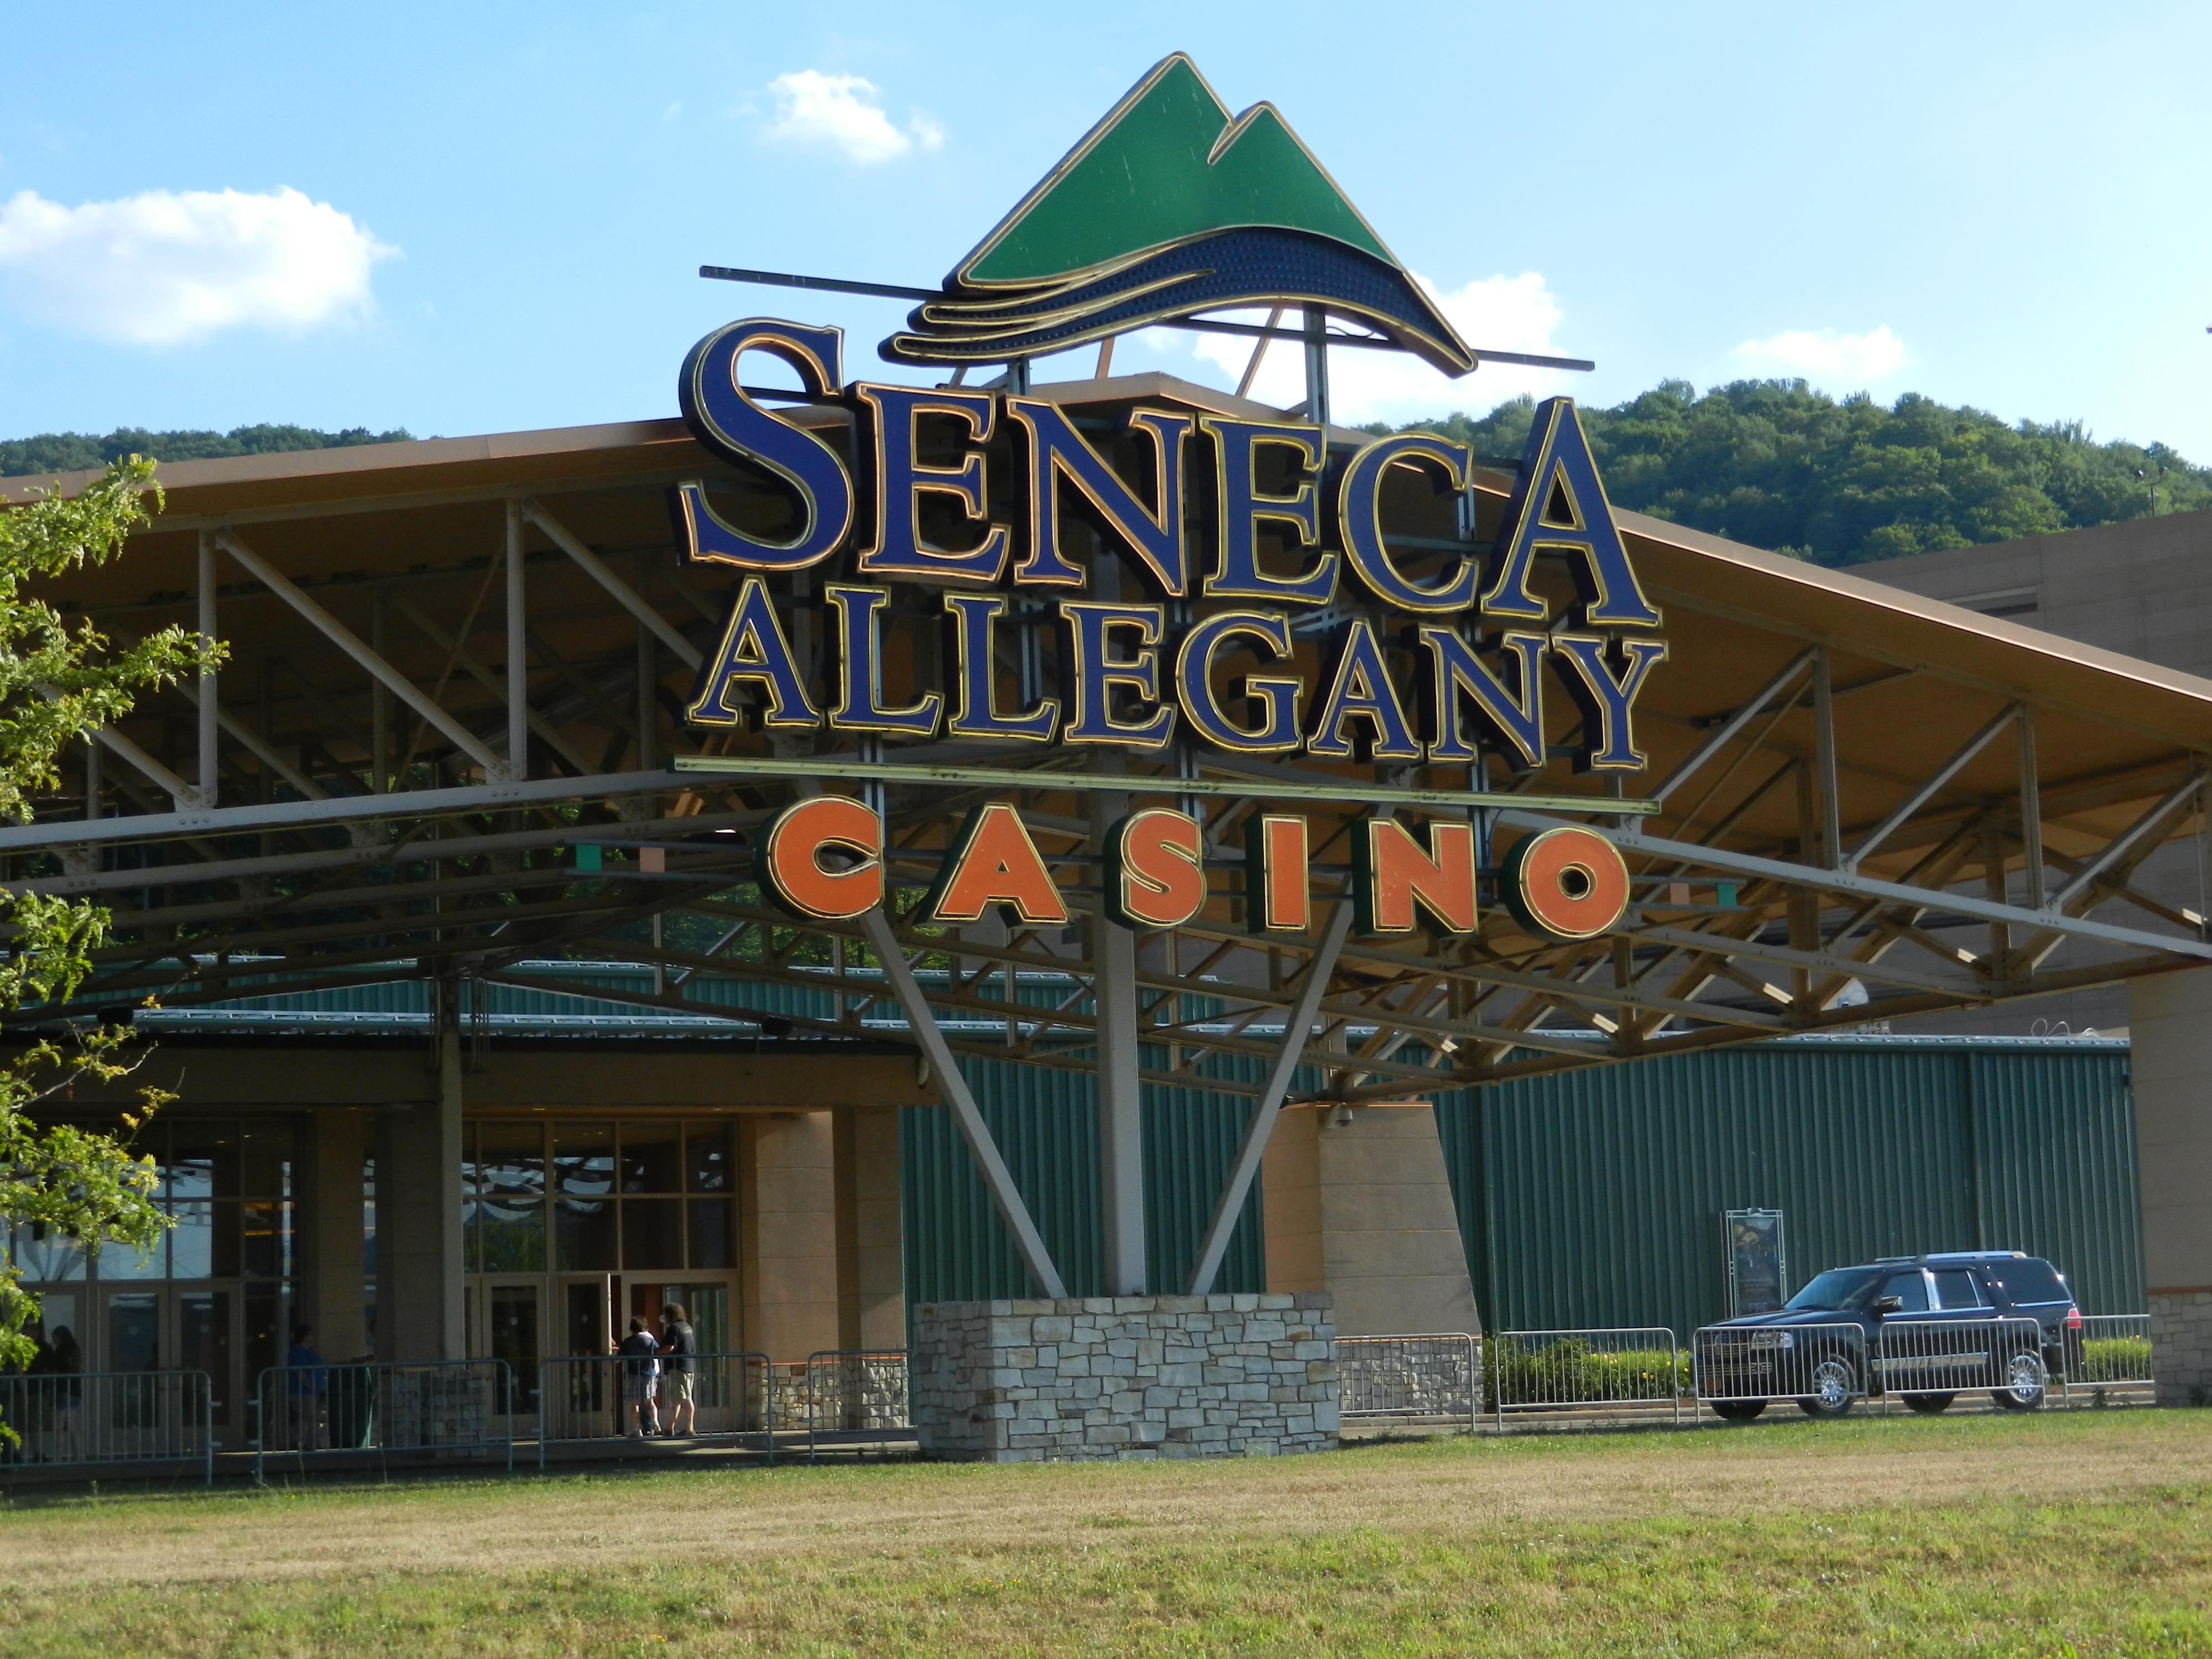 Seneca allegany bingo hall